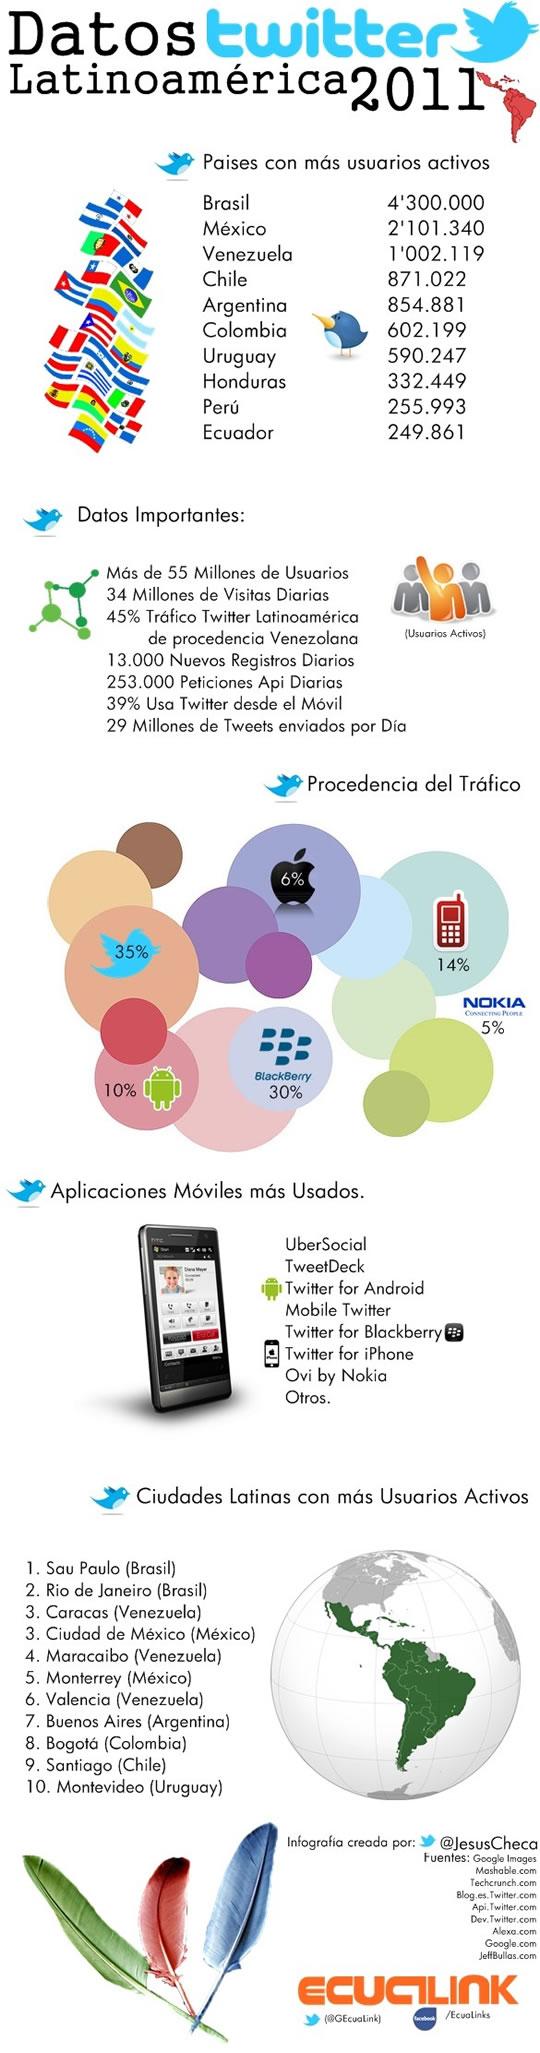 Twitter en Latino America datos tecnologia